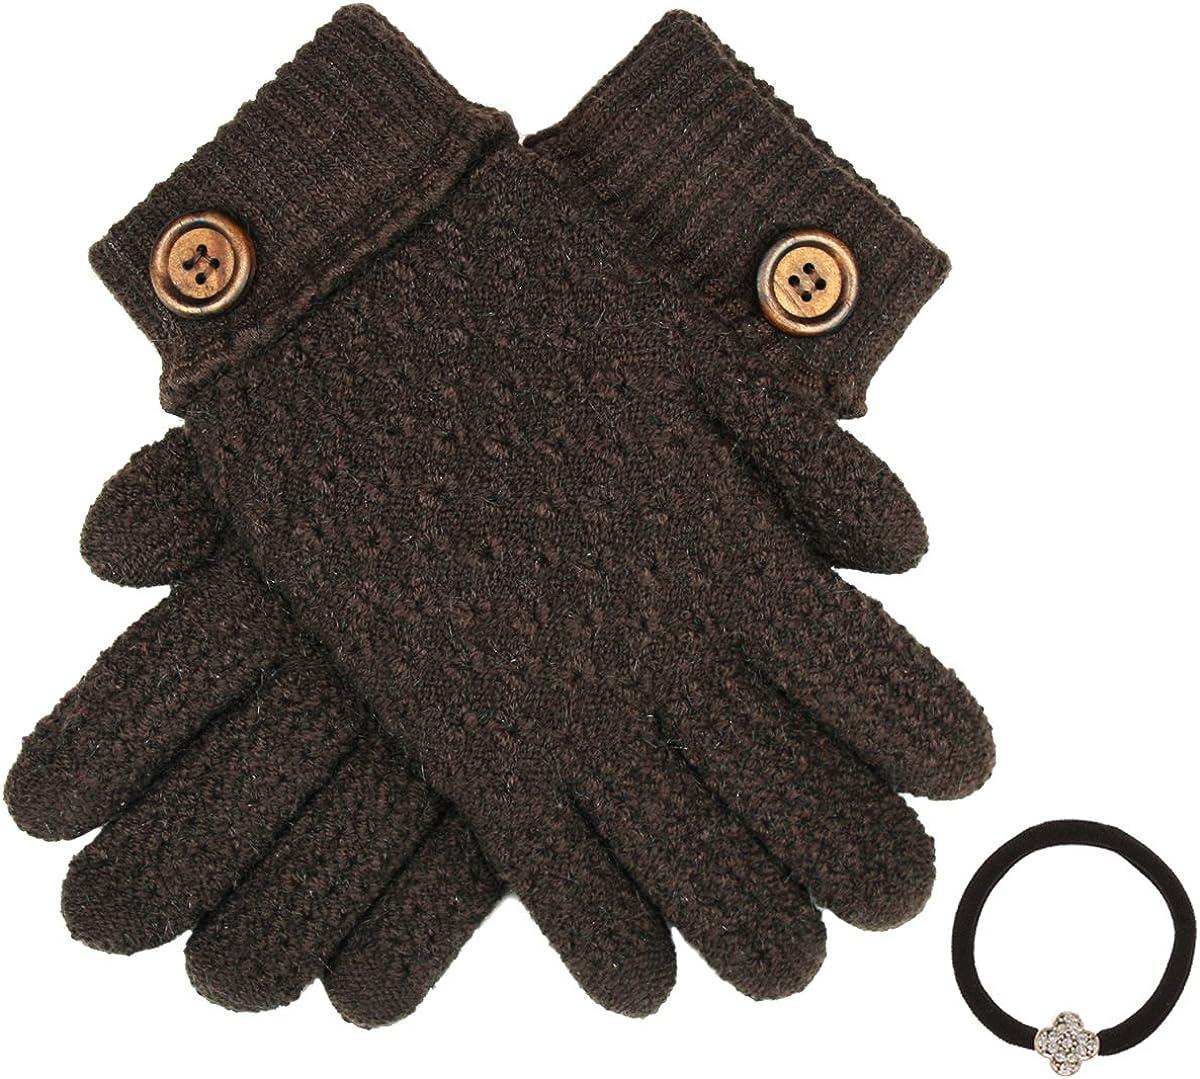 Women's Winter Premium Soft Knit Warm Faux Fur Lining Gloves with Hair Tie